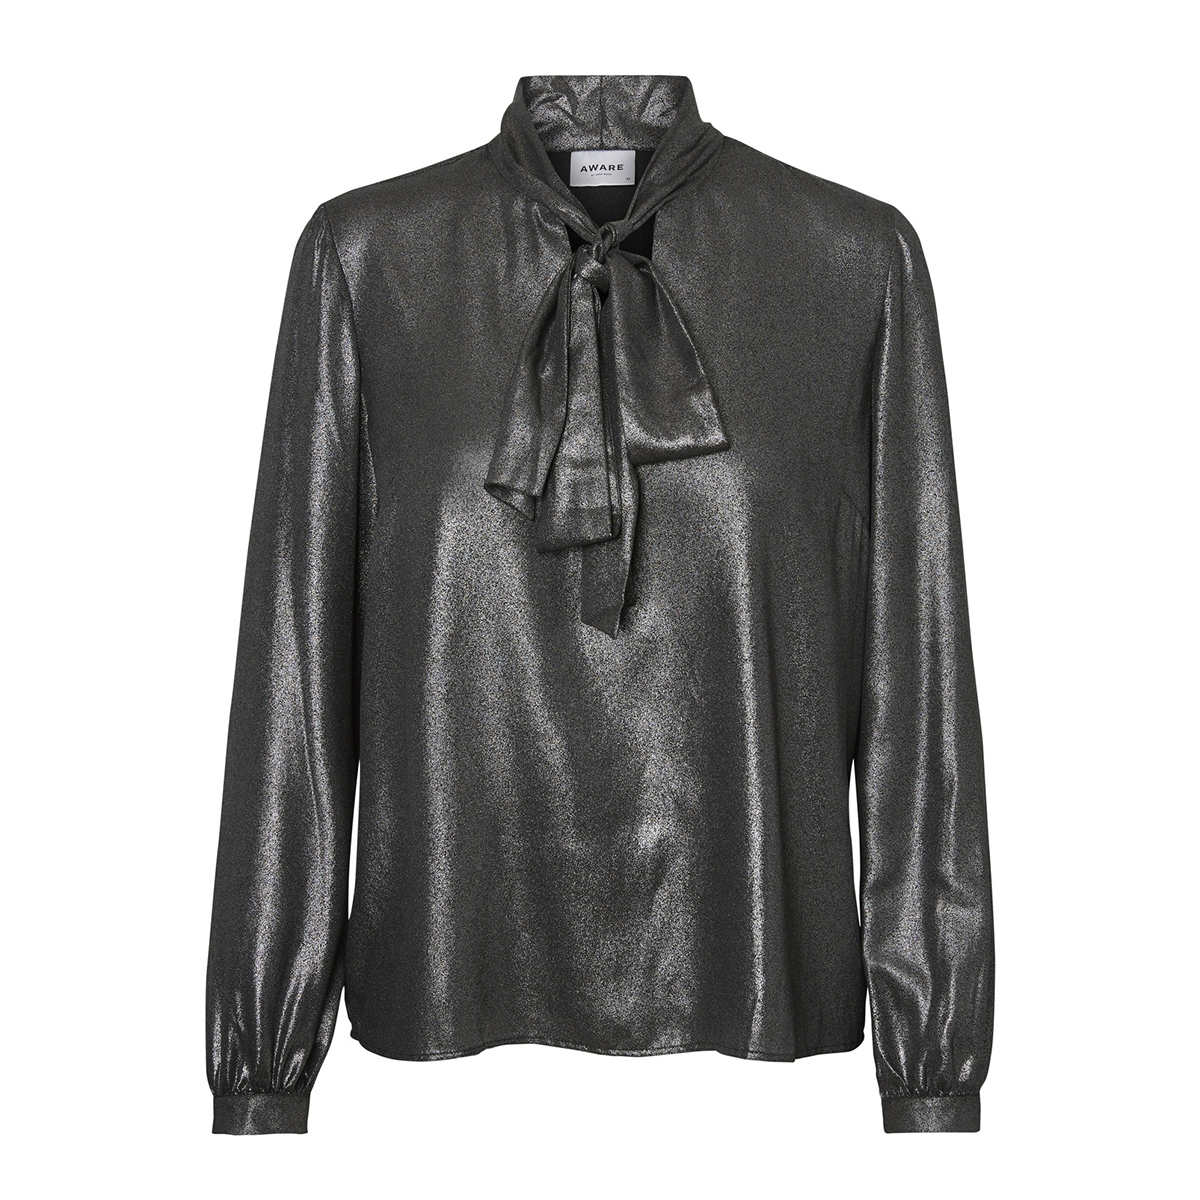 vmfairy ls top ga 10206001 vero moda blouse black/silver pri